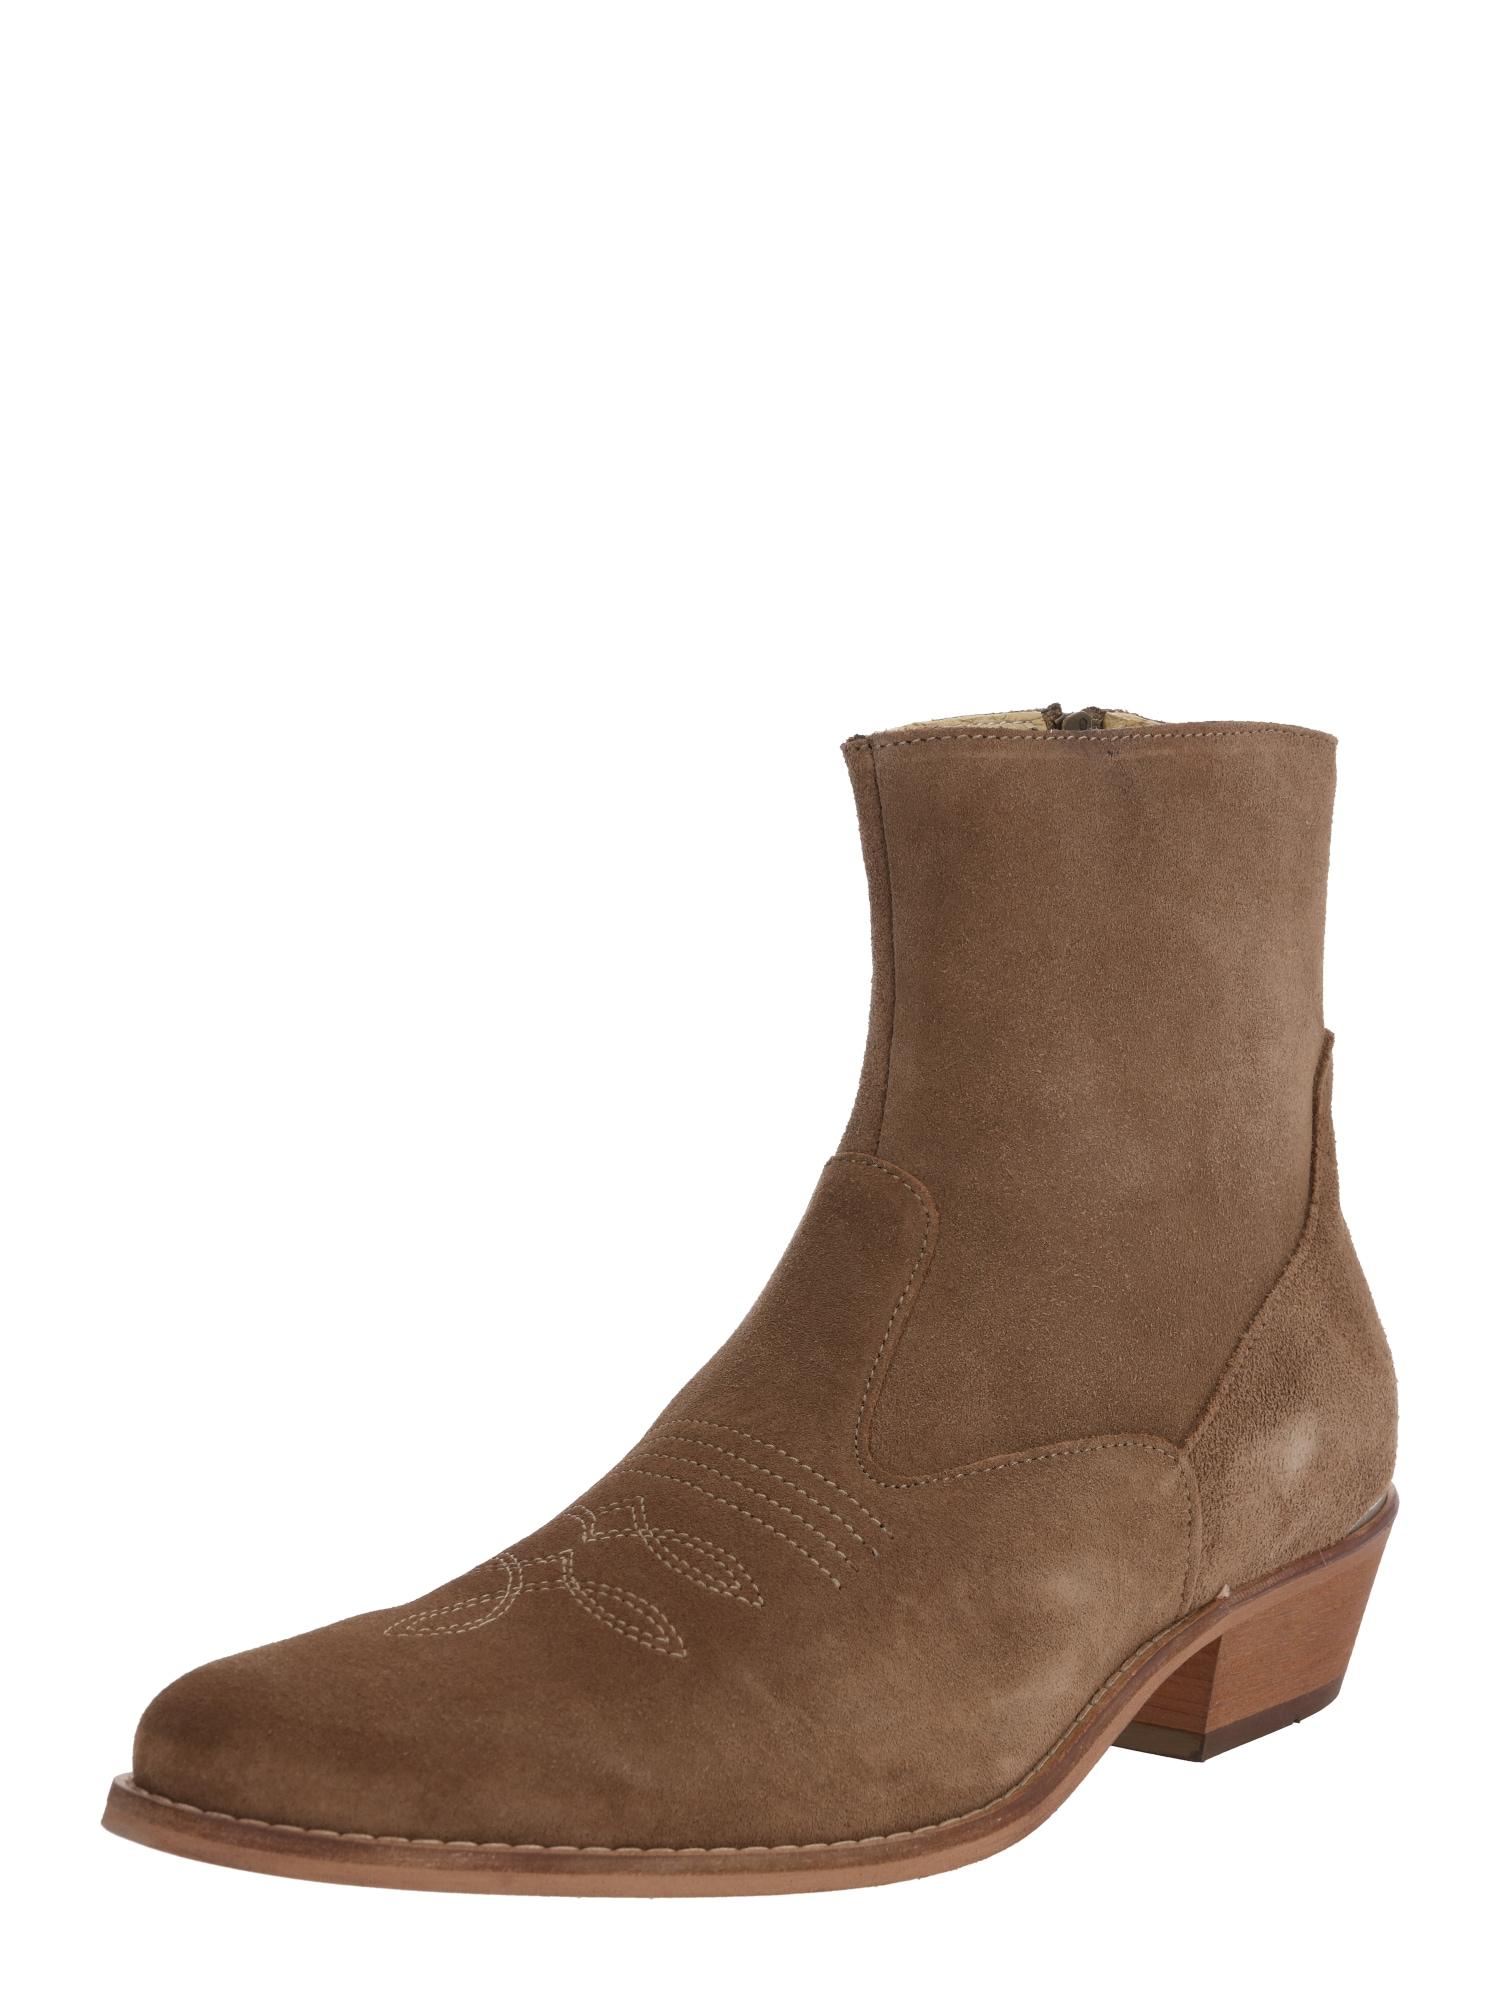 Shoe The Bear Kaubojiški batai 'ENZO' rausvai pilka